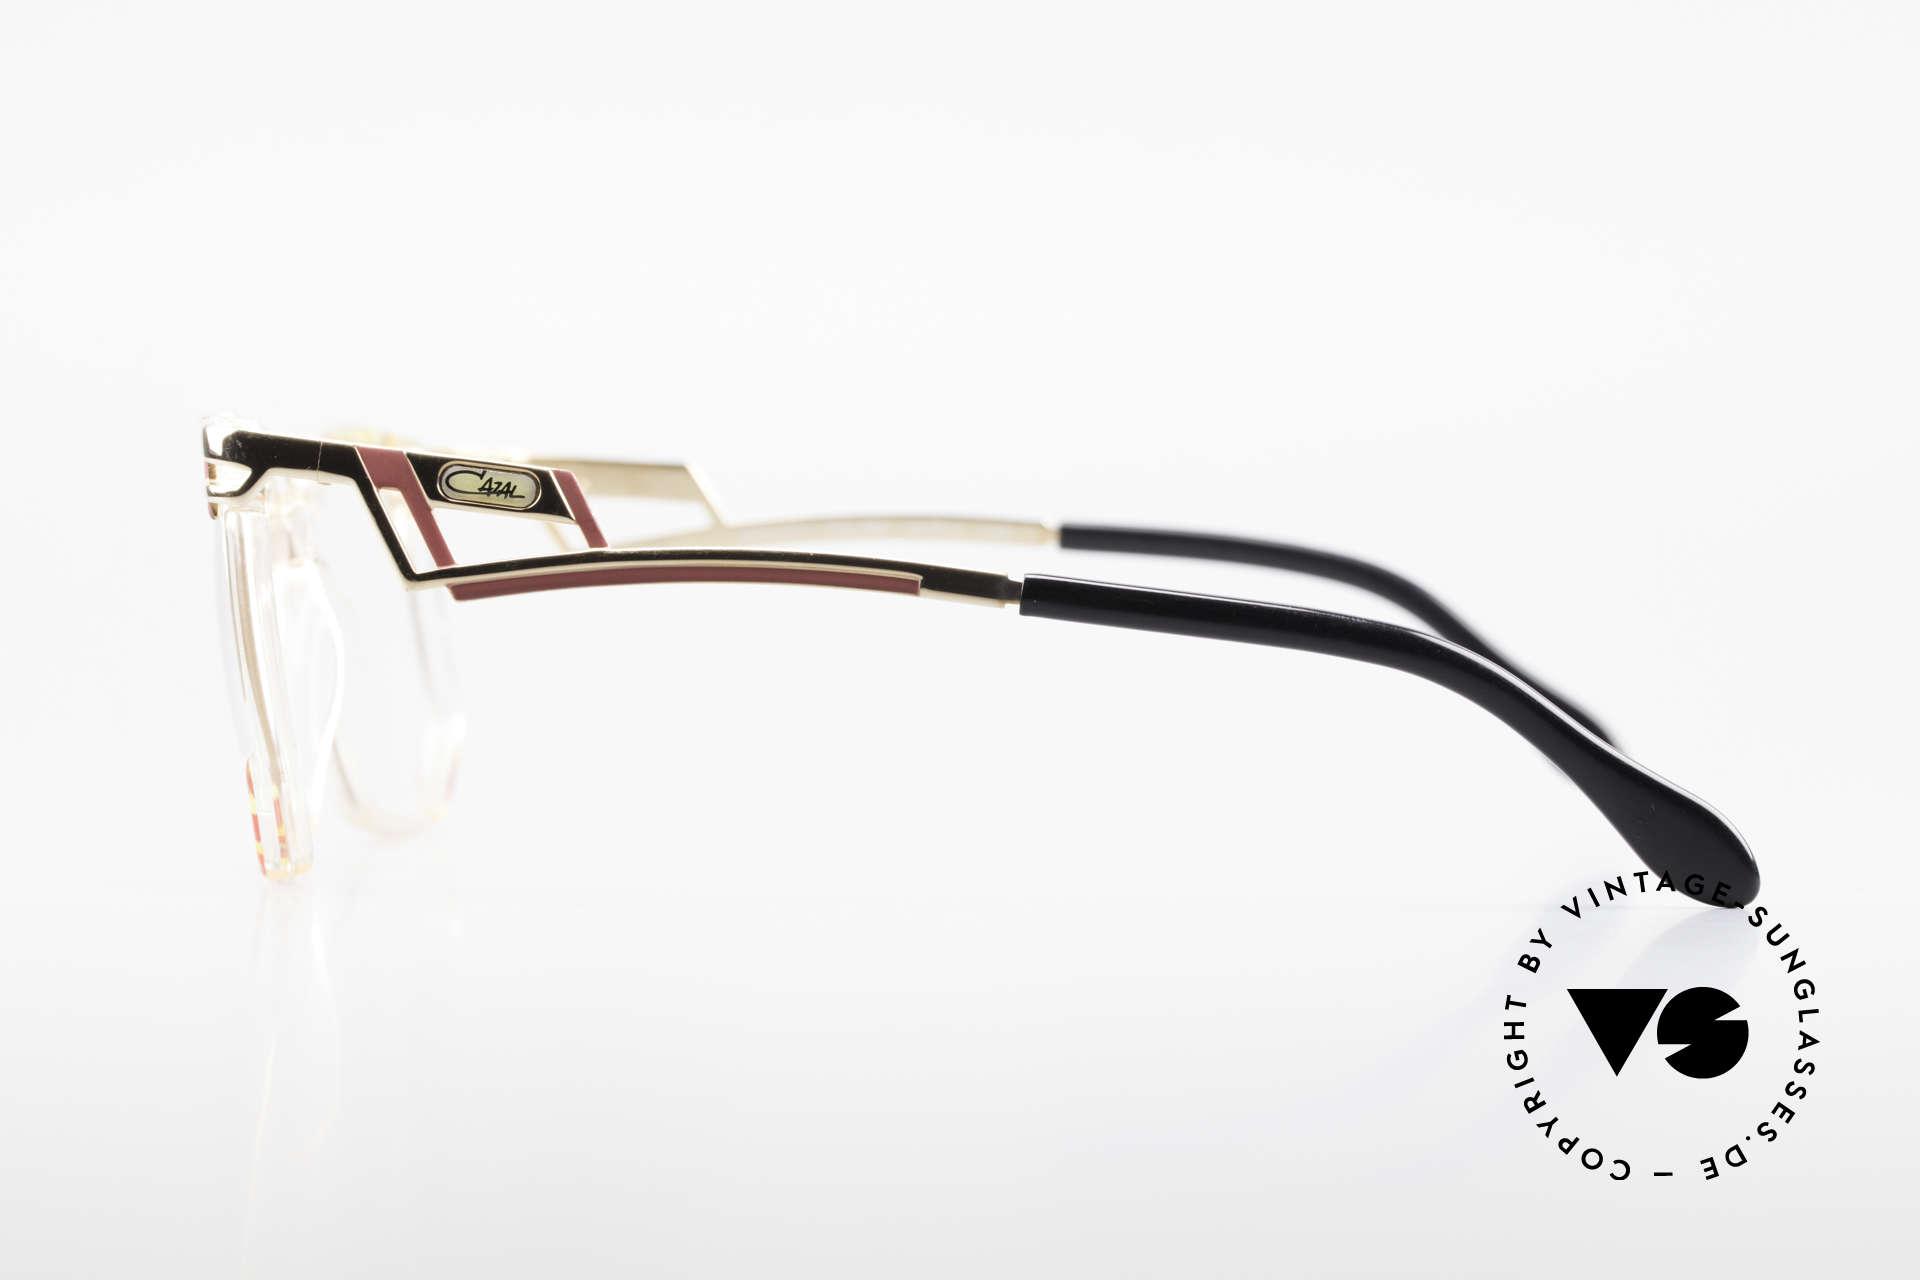 Cazal 351 Original Vintage Cazal HipHop, the Cazal demo lenses can be replaced optionally, Made for Women